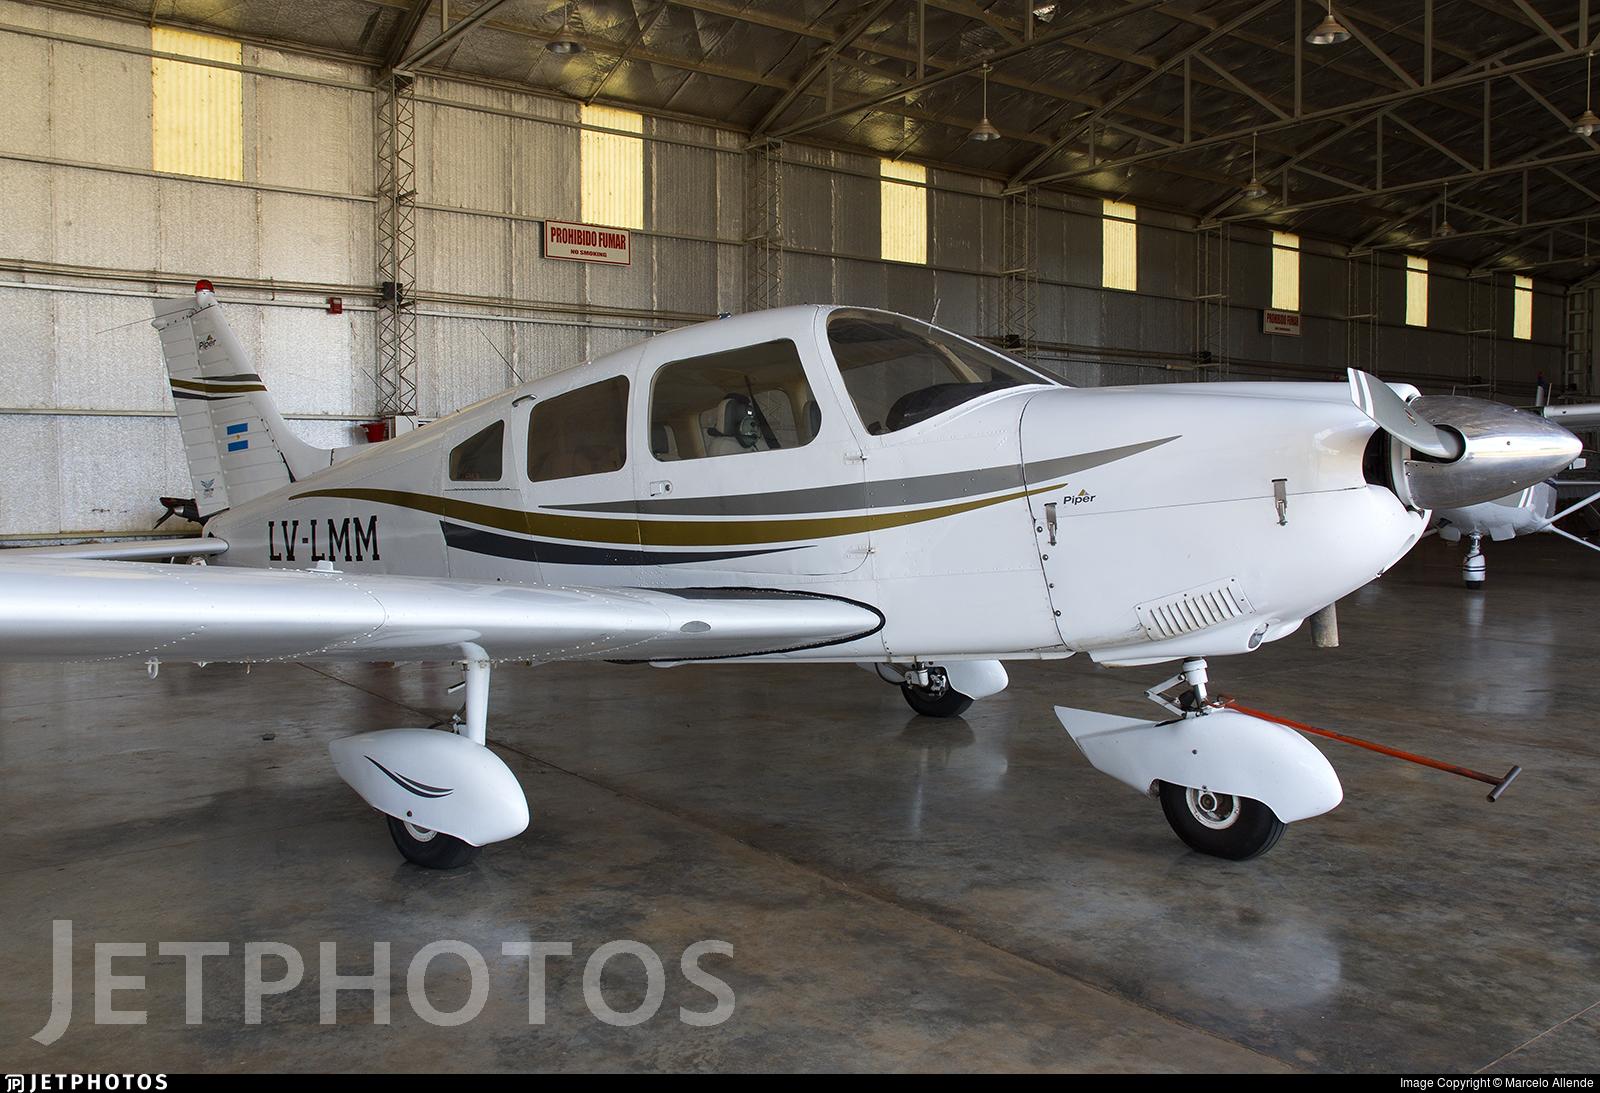 LV-LMM - Chincul PA-A-28-200R Arrow - Private